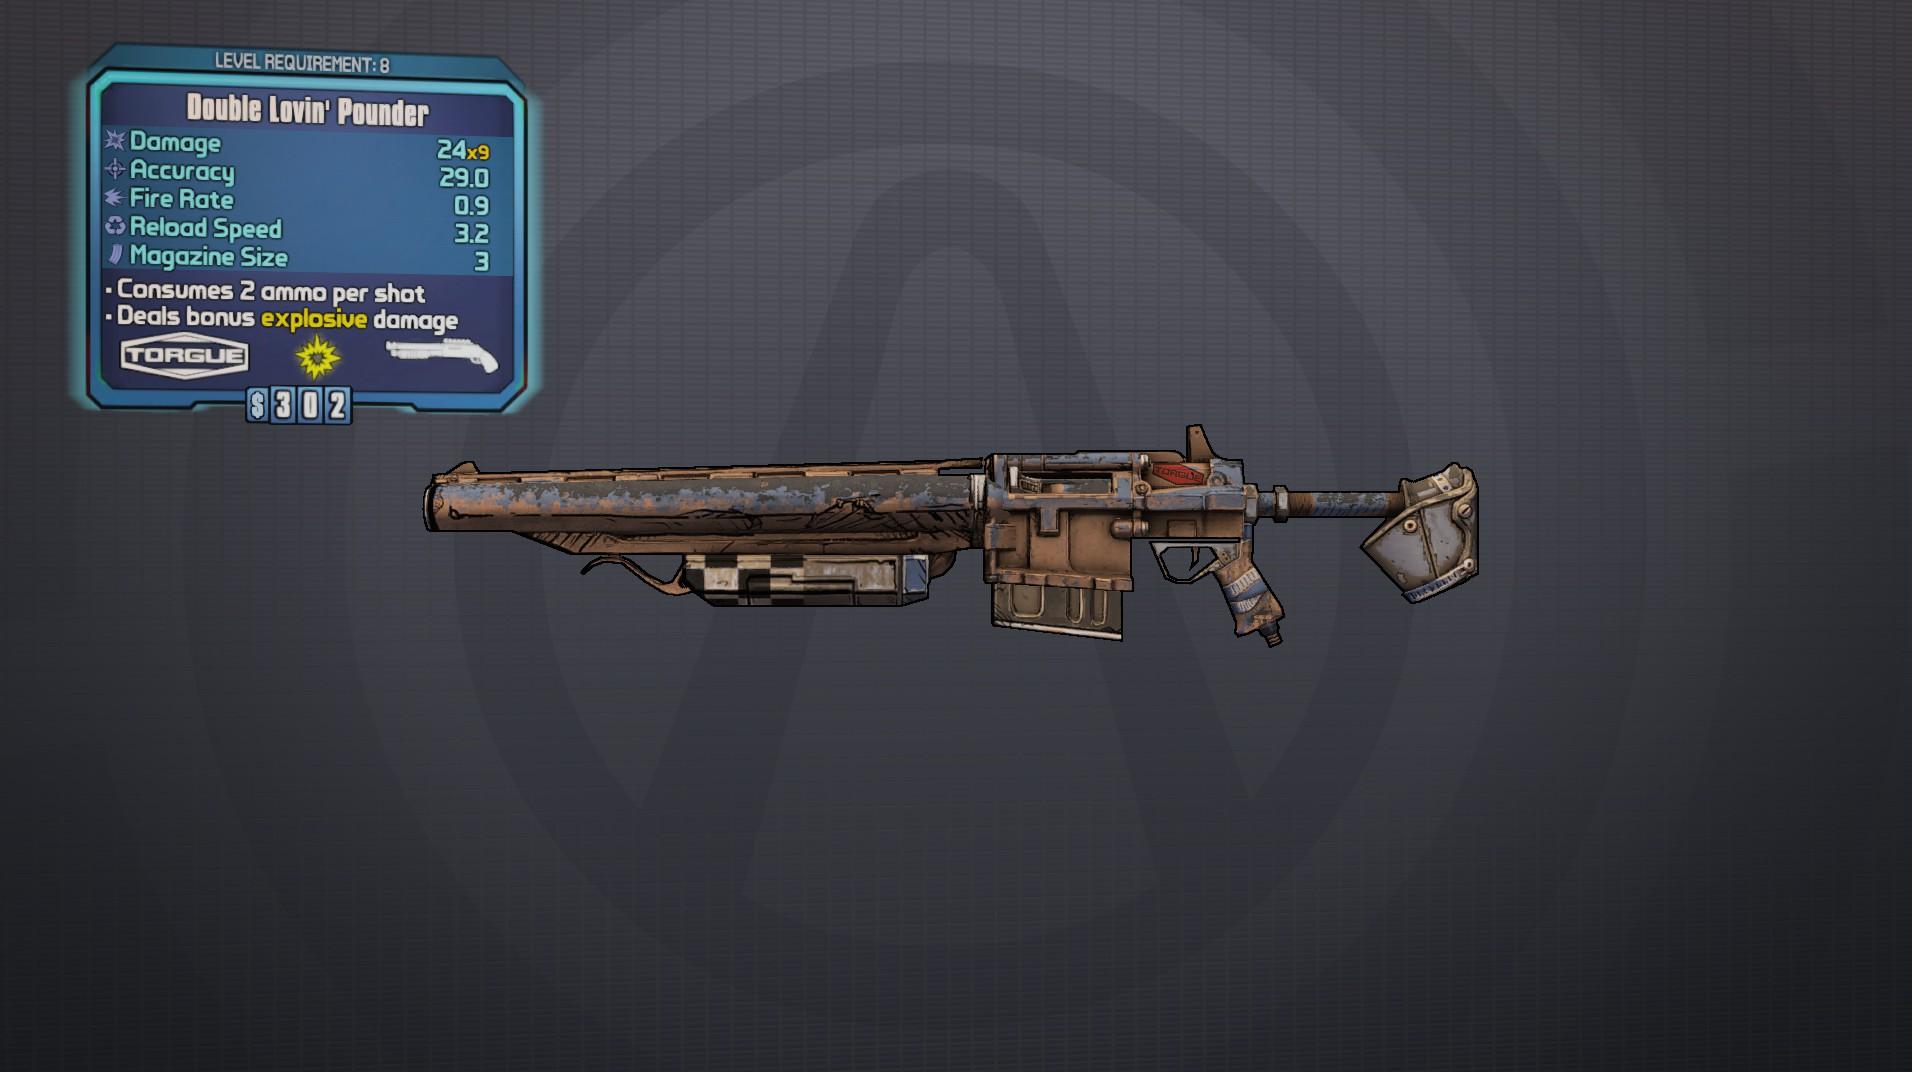 Pounder (shotgun)